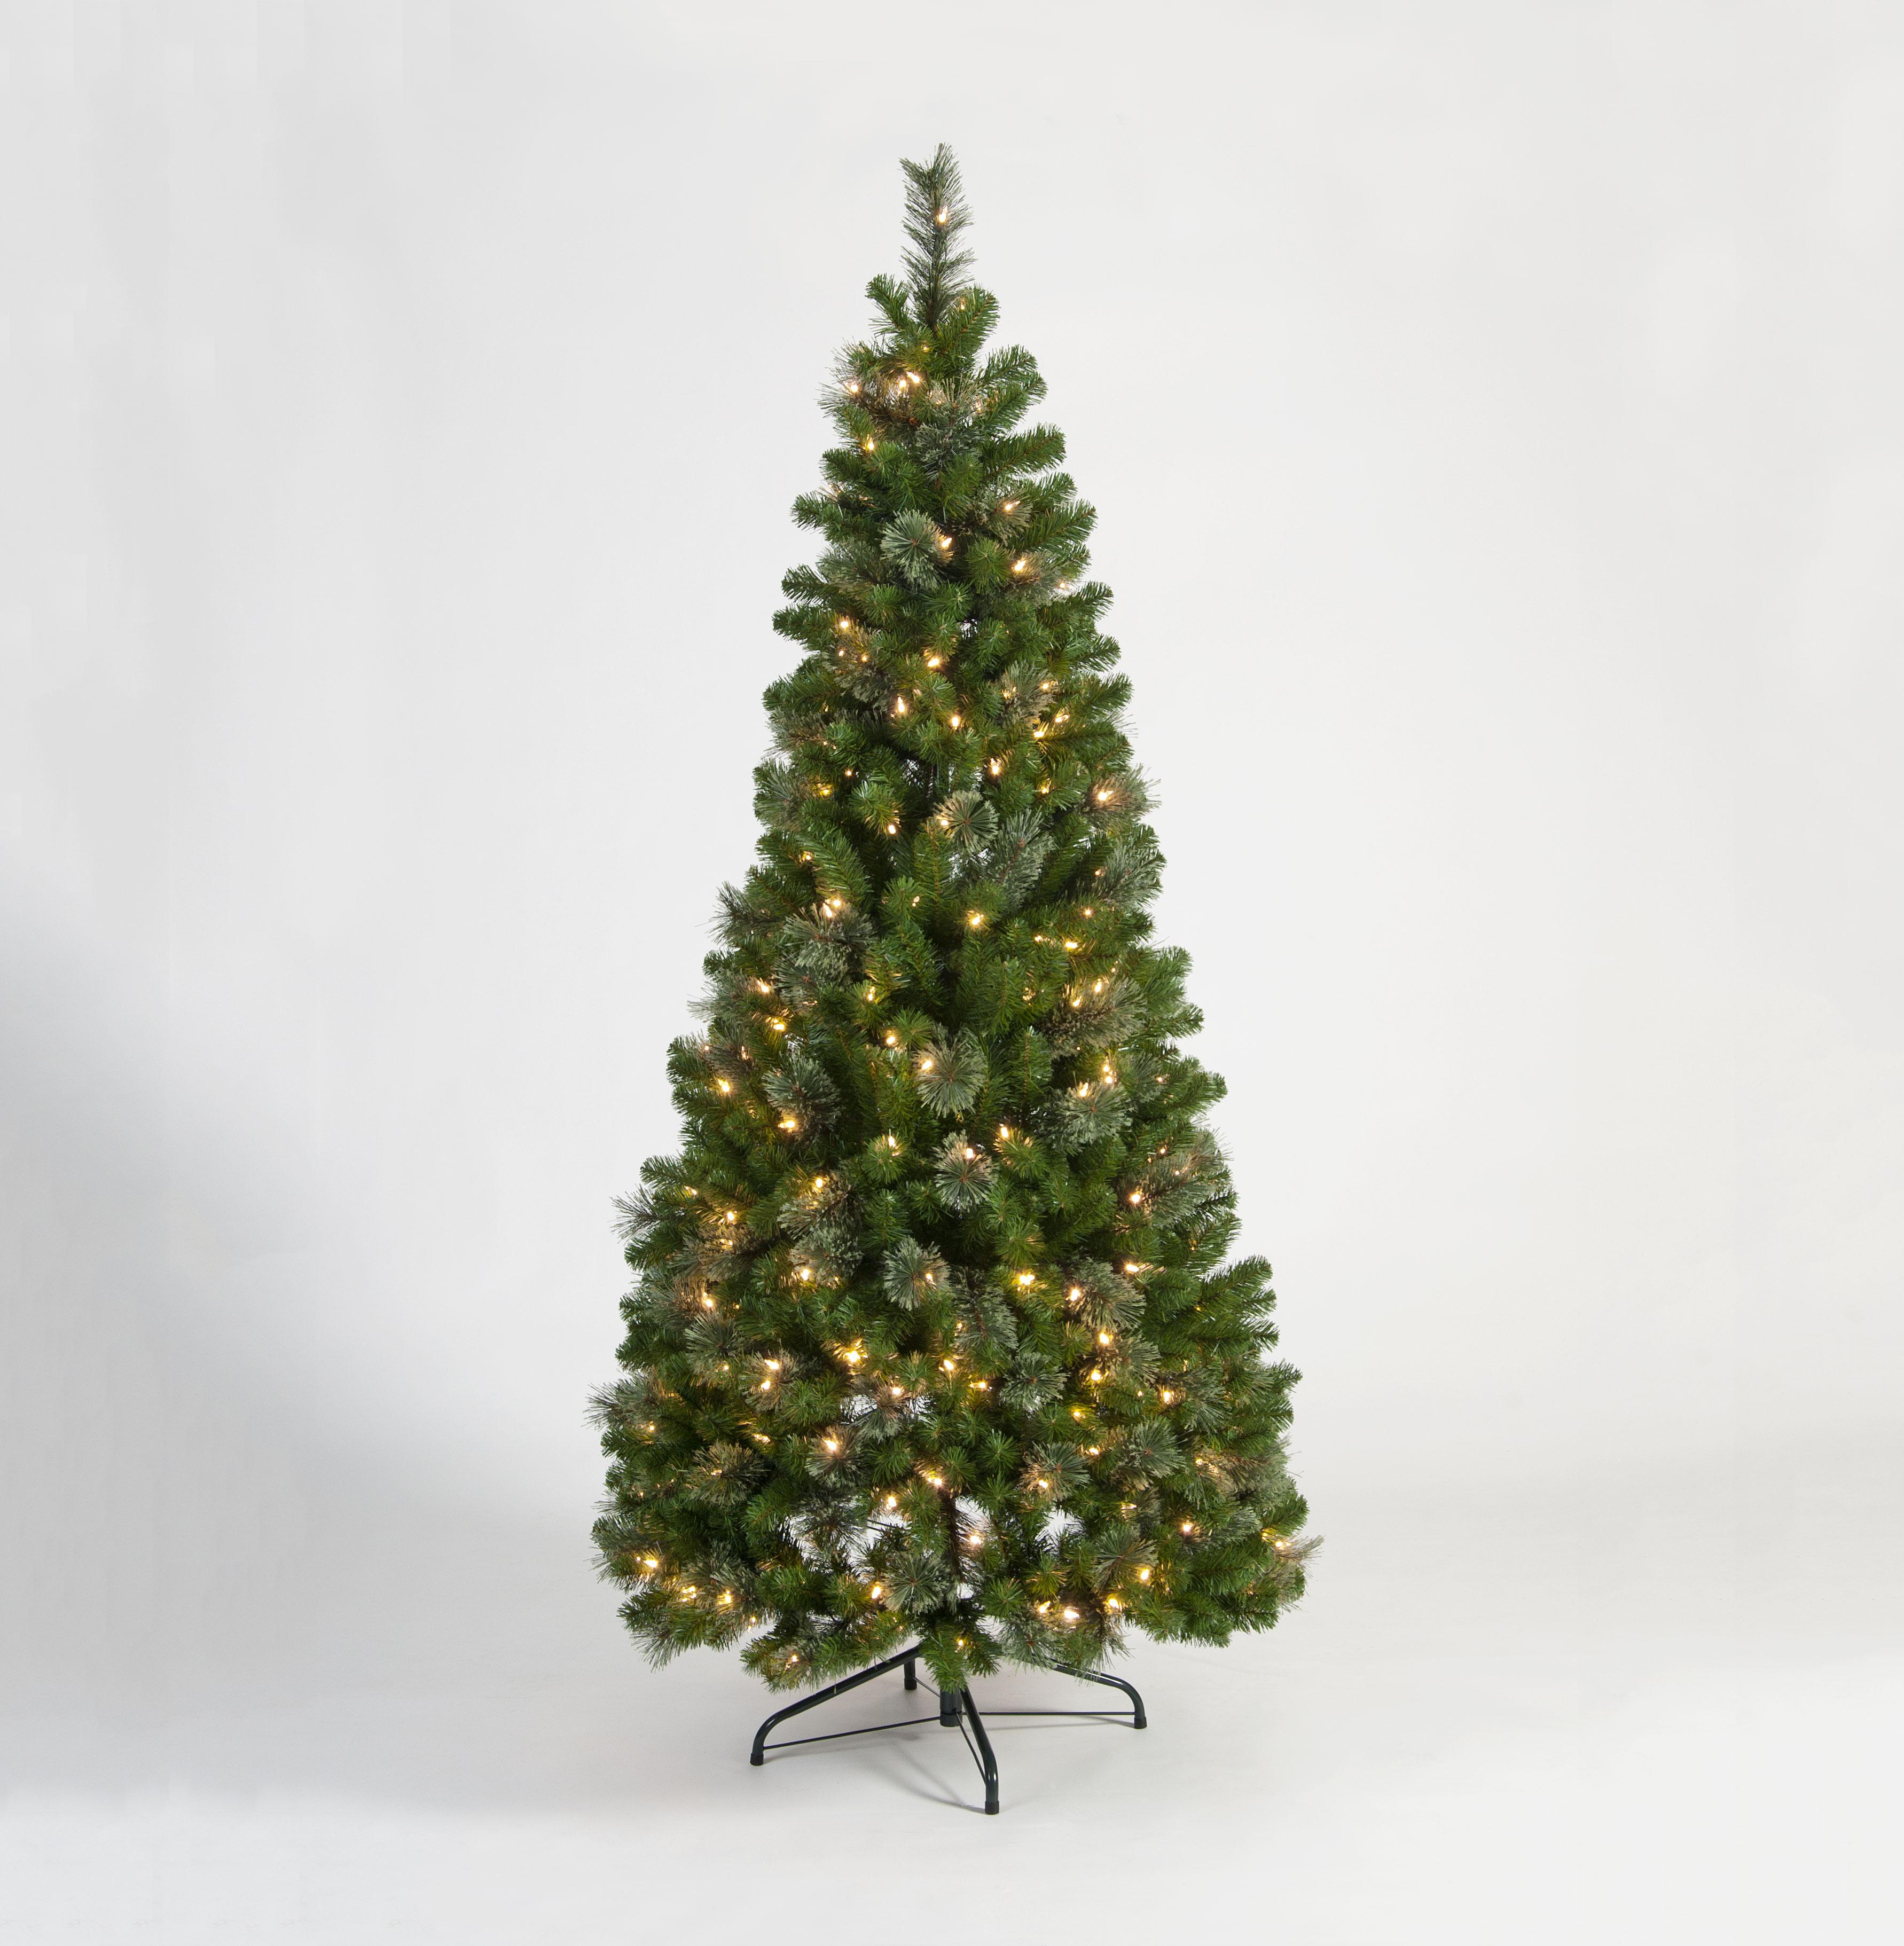 Pre Lit Pop Up Christmas Tree Uk.Williston Pre Lit Pop Up Artificial Christmas Tree